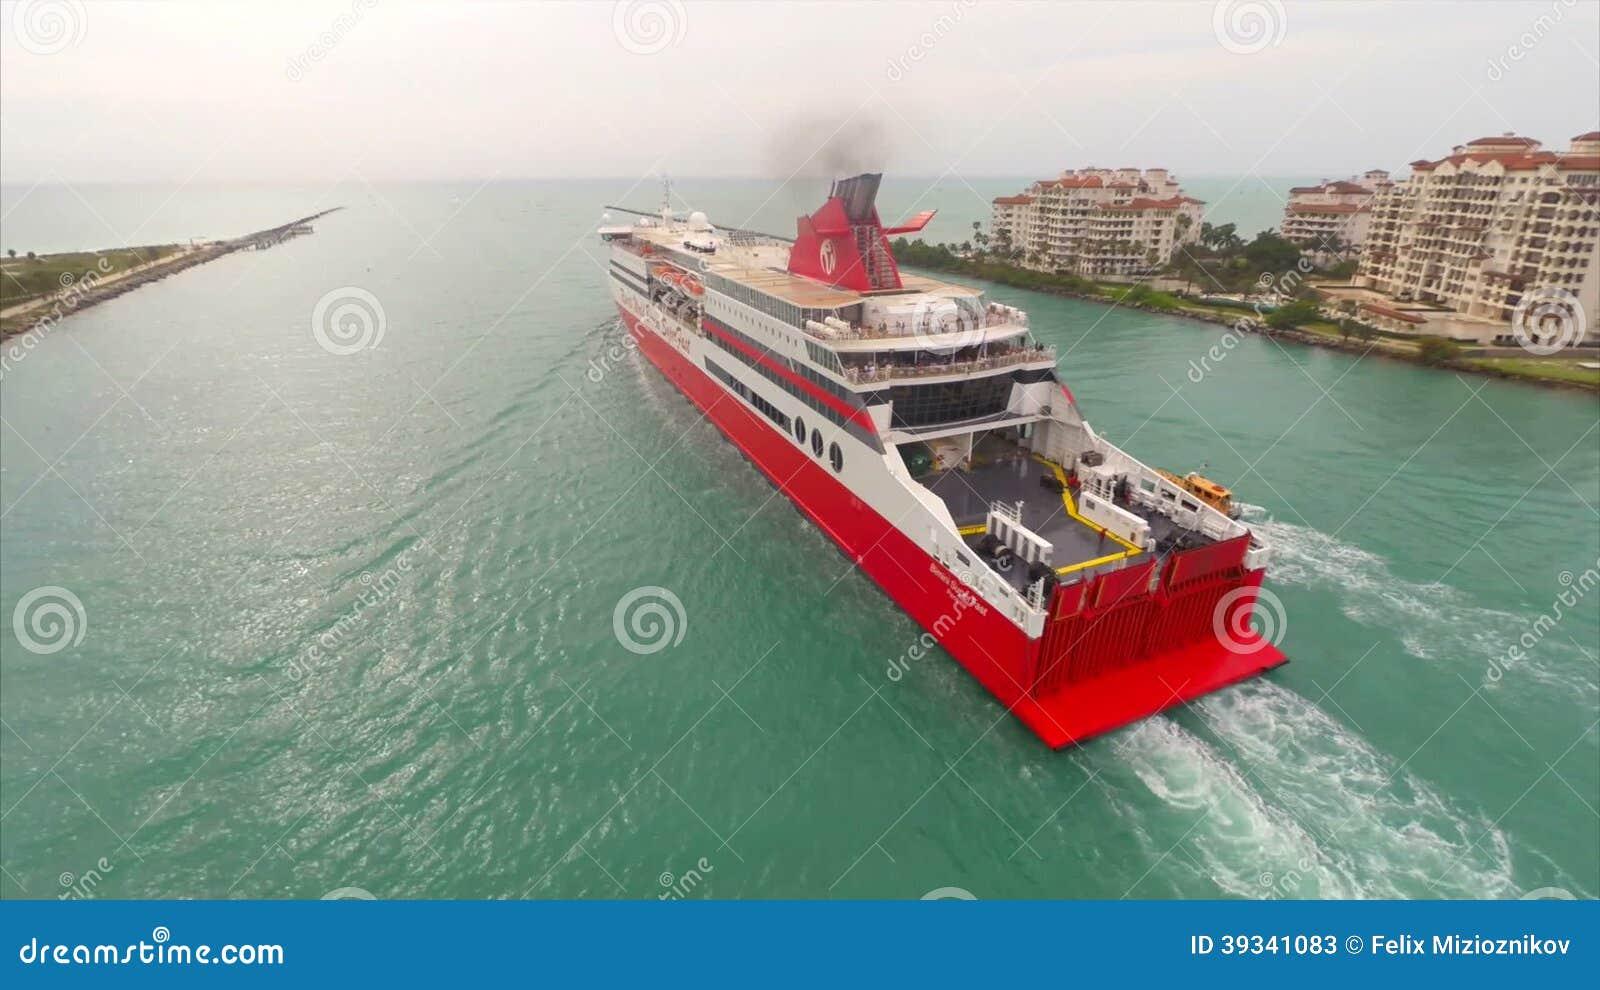 Aerial Bimini Super Fast Cruise Ship Stock Video Video Of Boat - Bimini superfast cruise ship